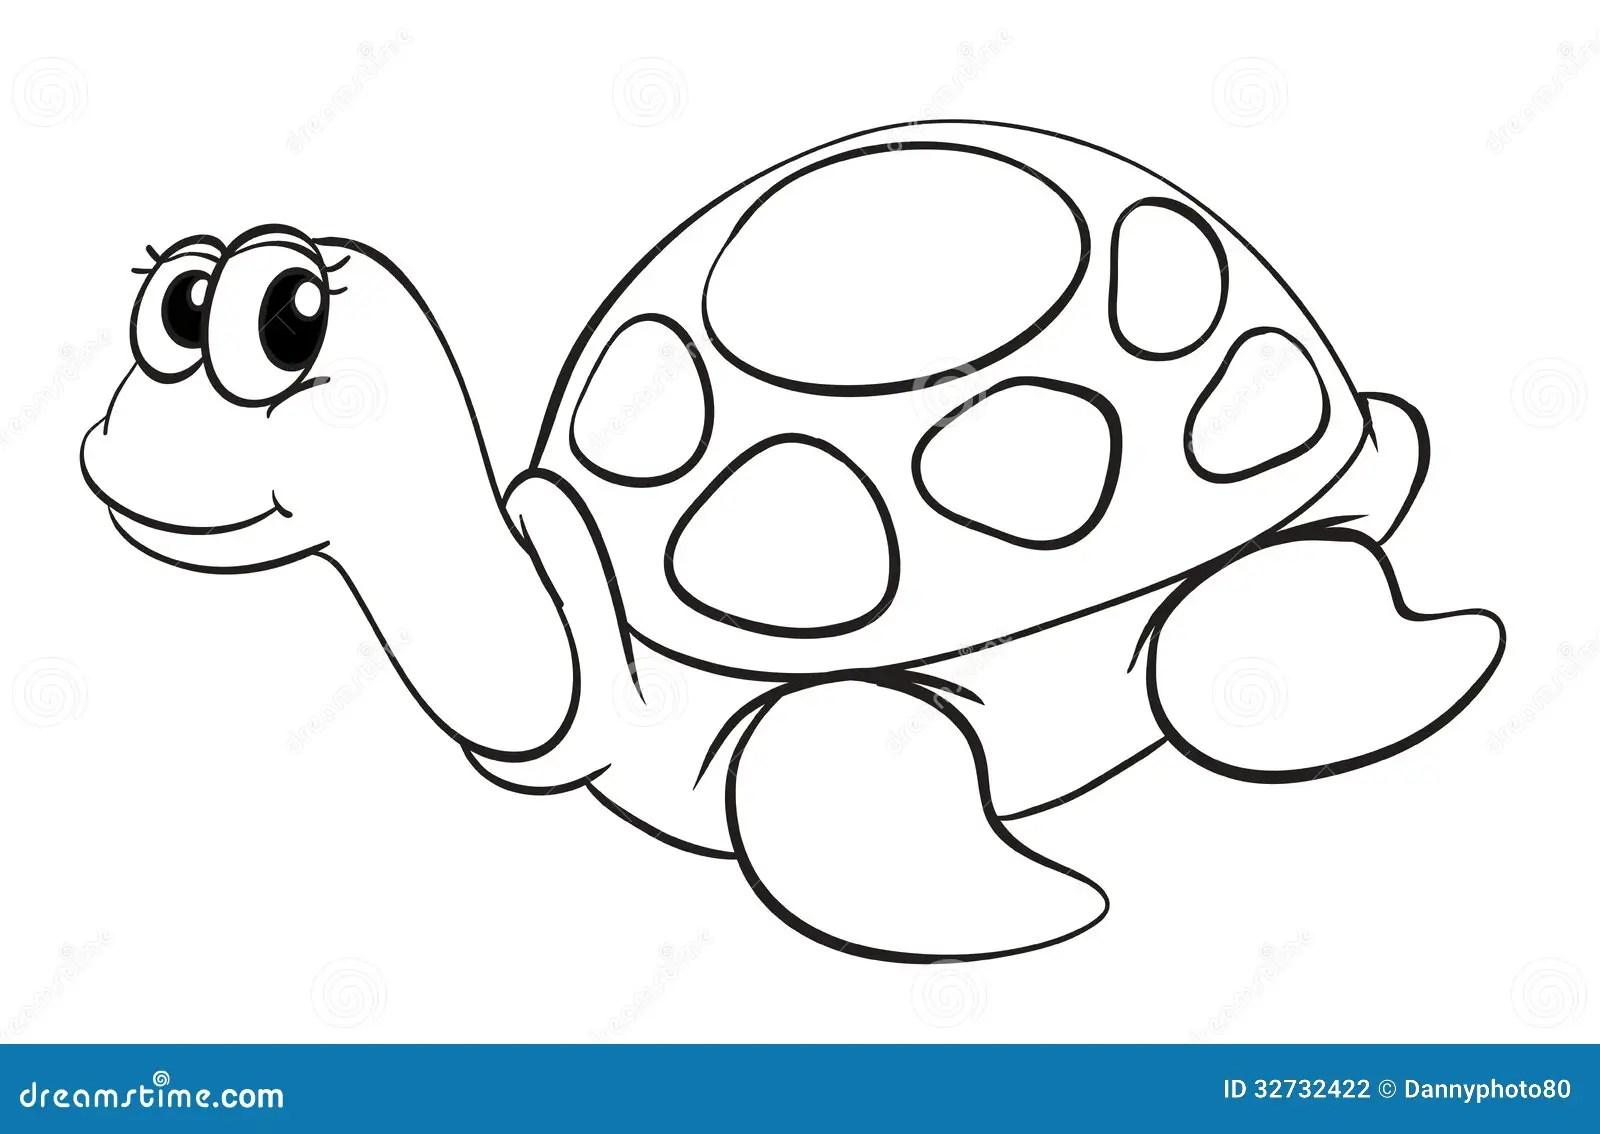 A Tortoise Sketch Stock Vector Illustration Of